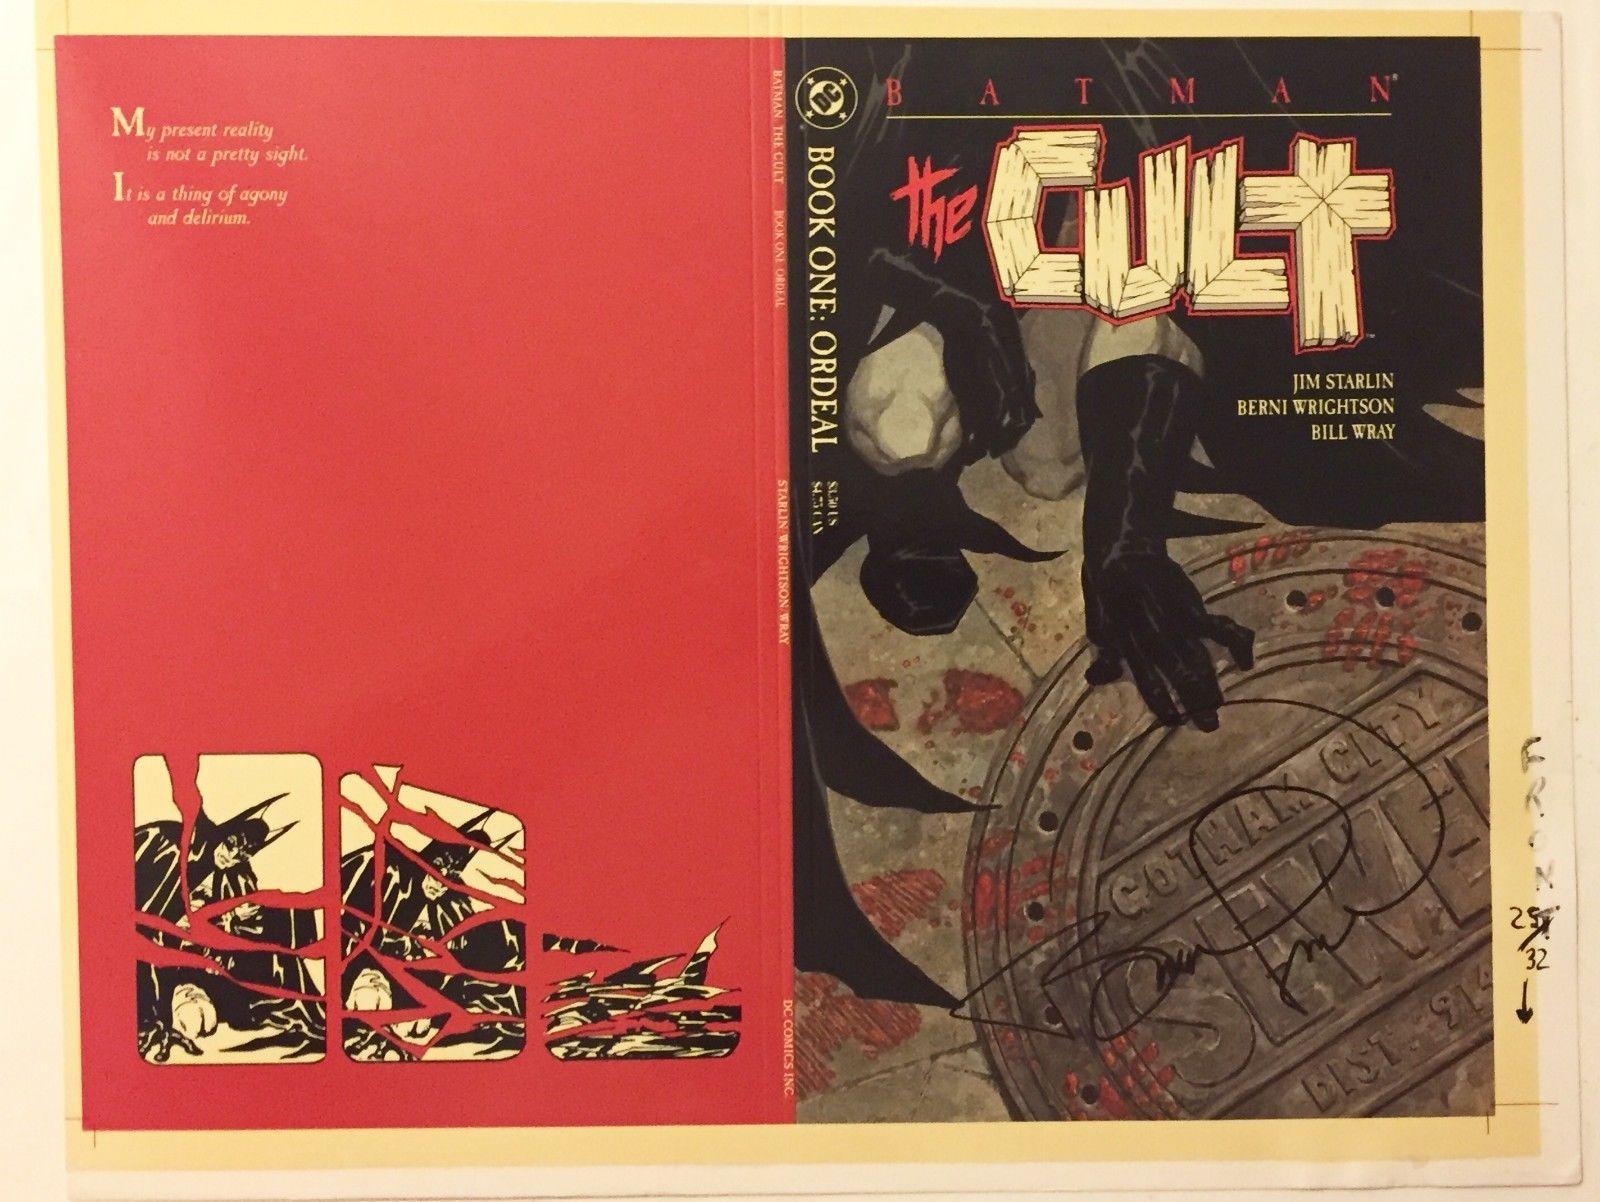 Bernie Wrightson BATMAN: THE CULT #1 cover DC Comics original art proof, SIGNED